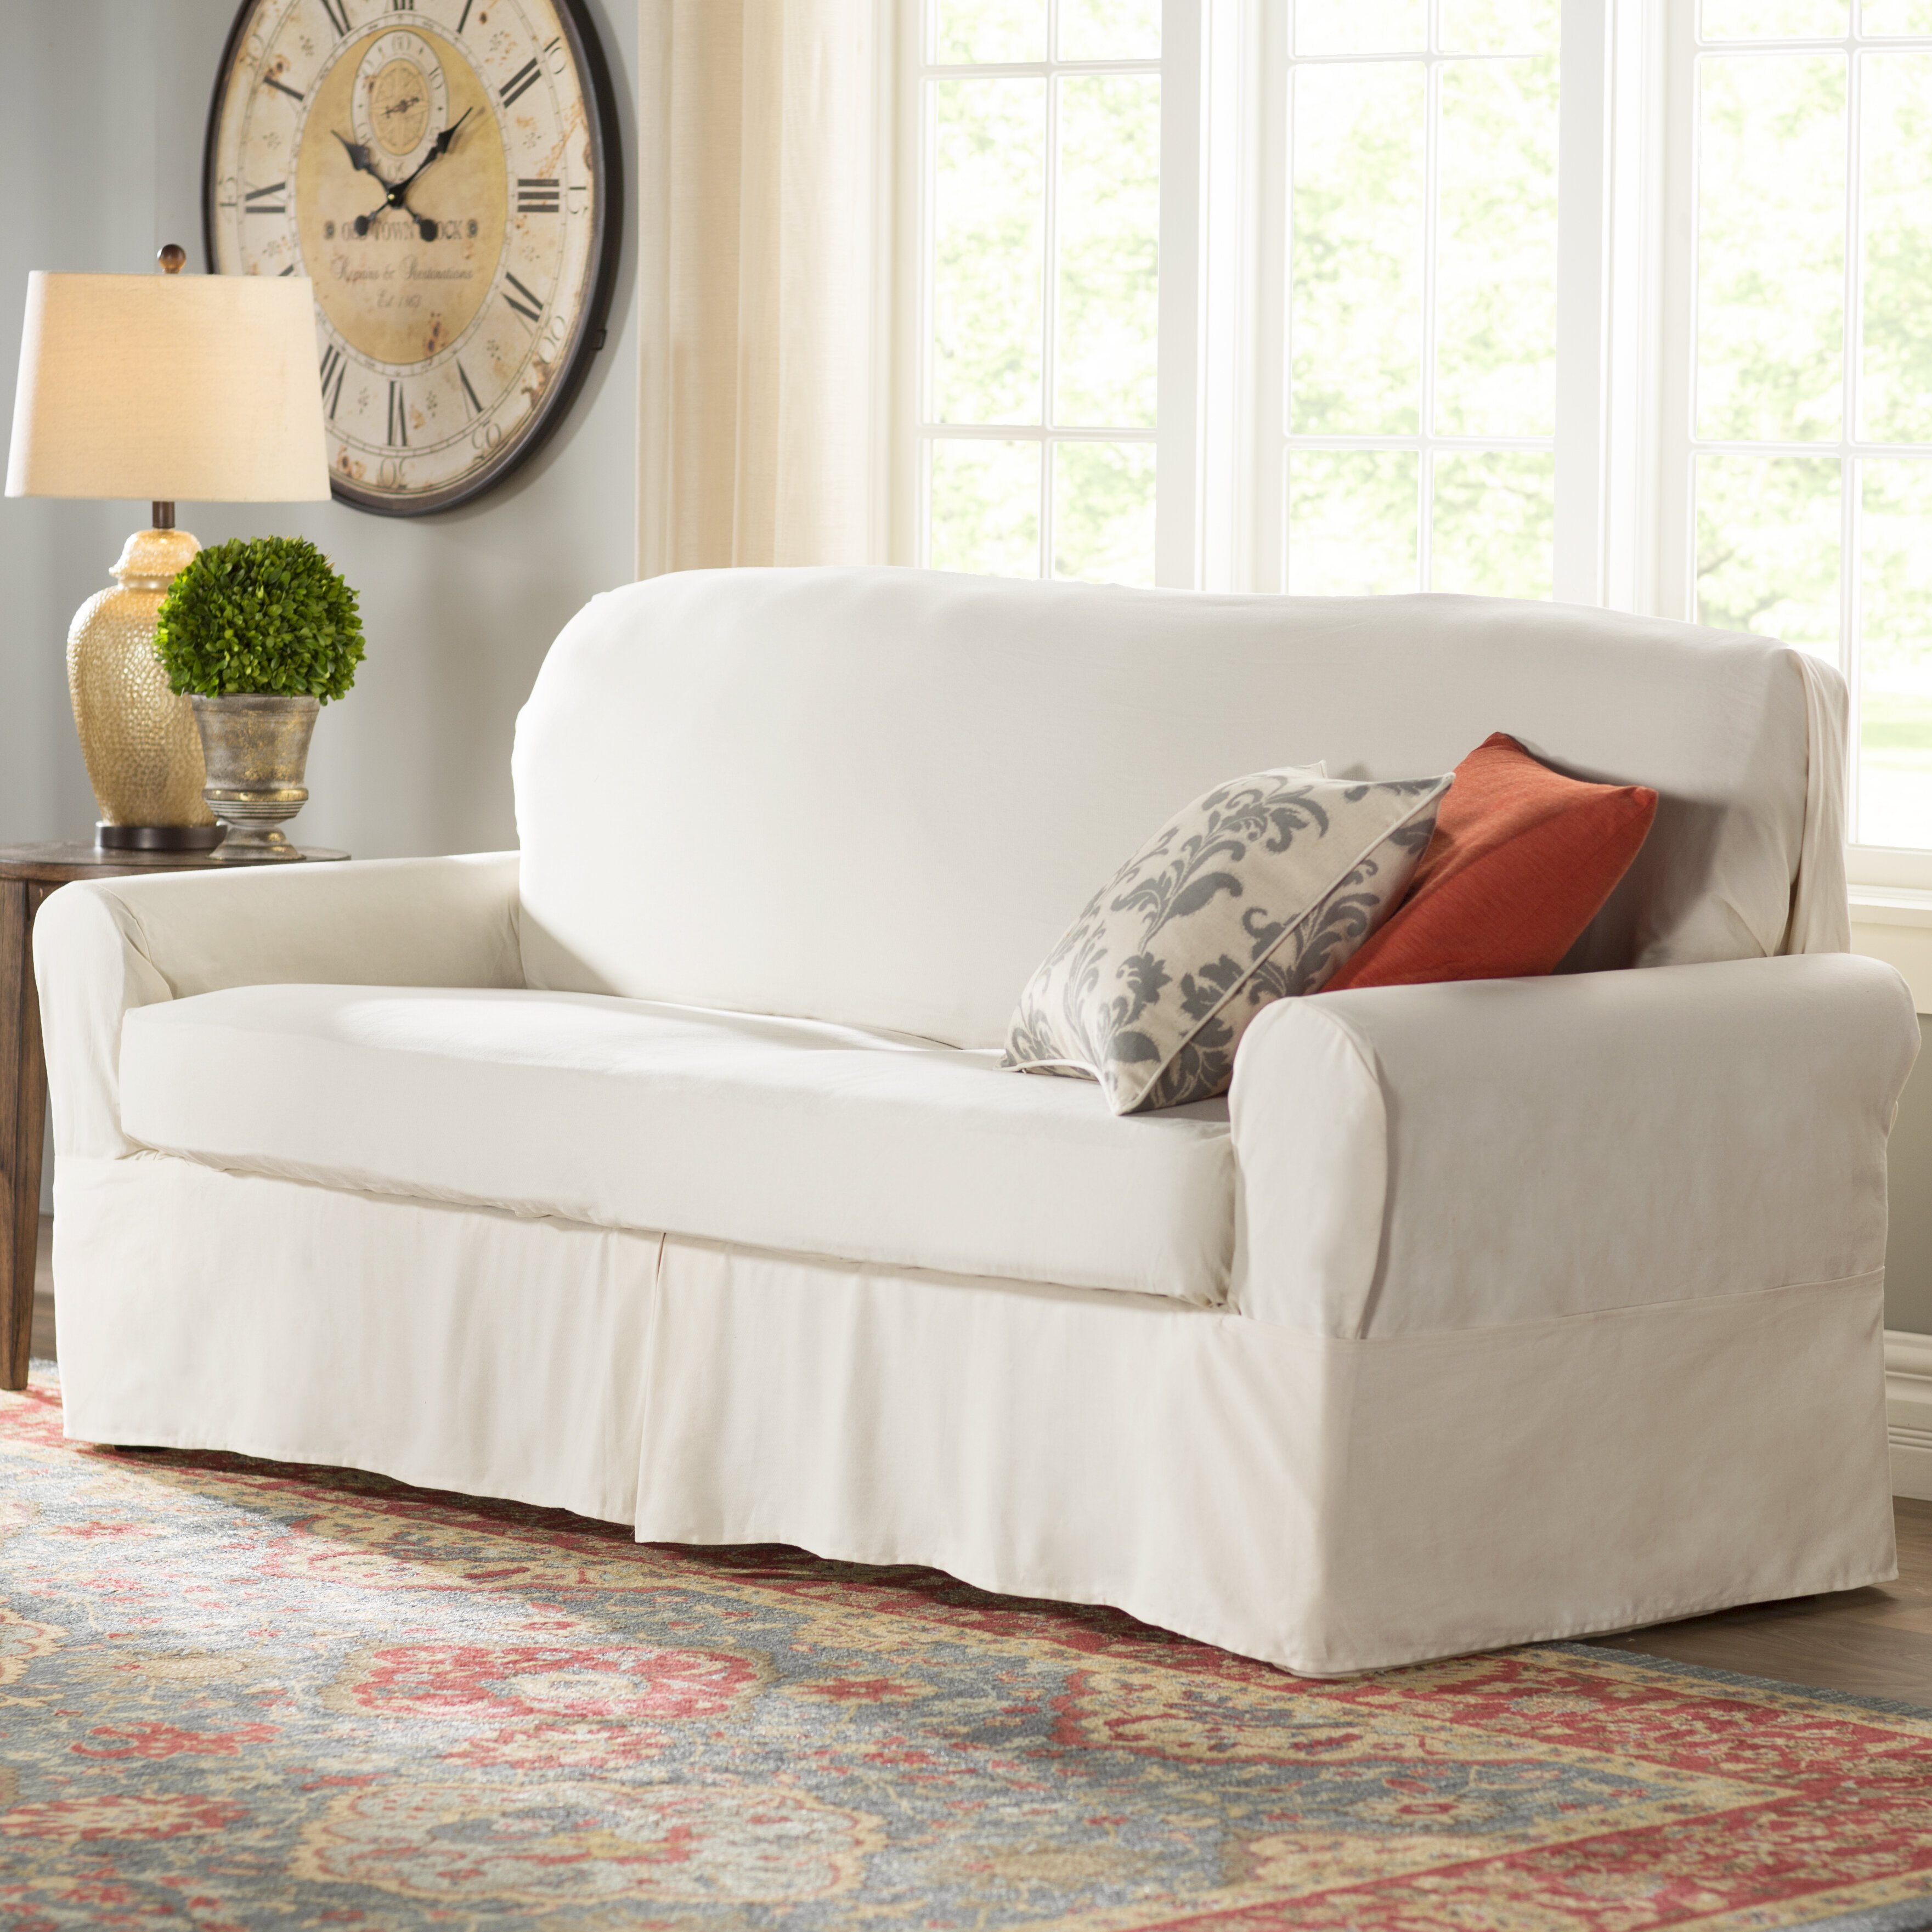 Darby Home Co Box Cushion Sofa Slipcover U0026 Reviews | Wayfair